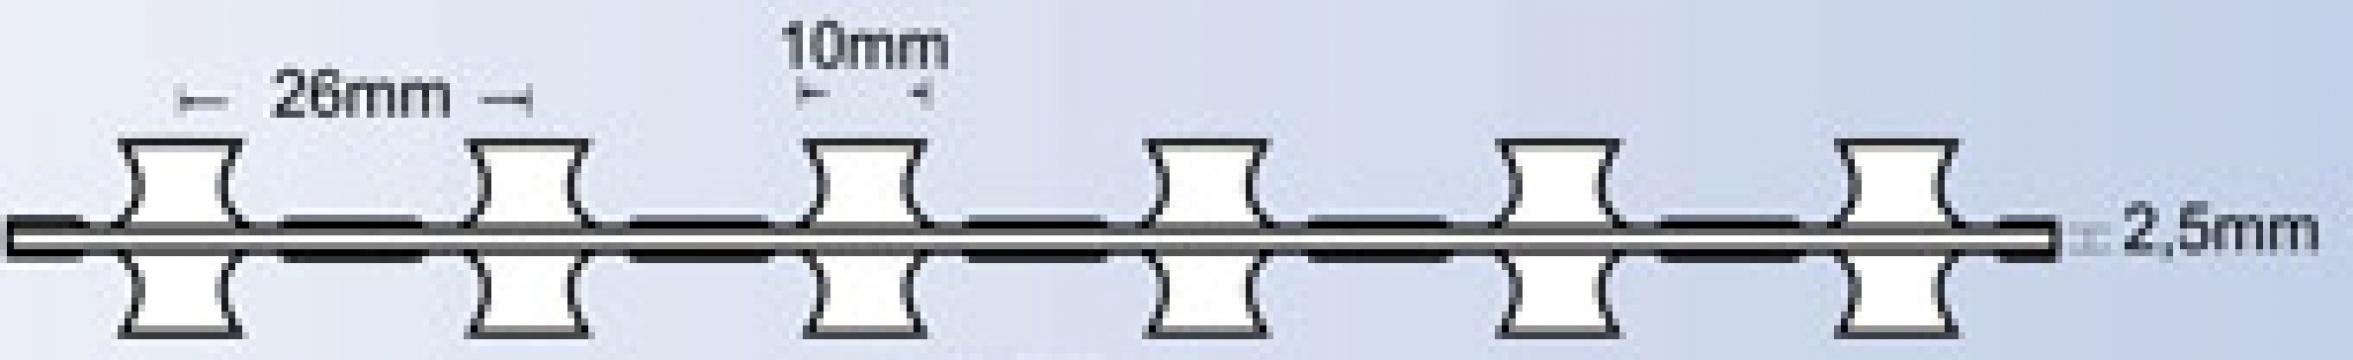 Sarma lamata BTO 10 concertina fara cleme